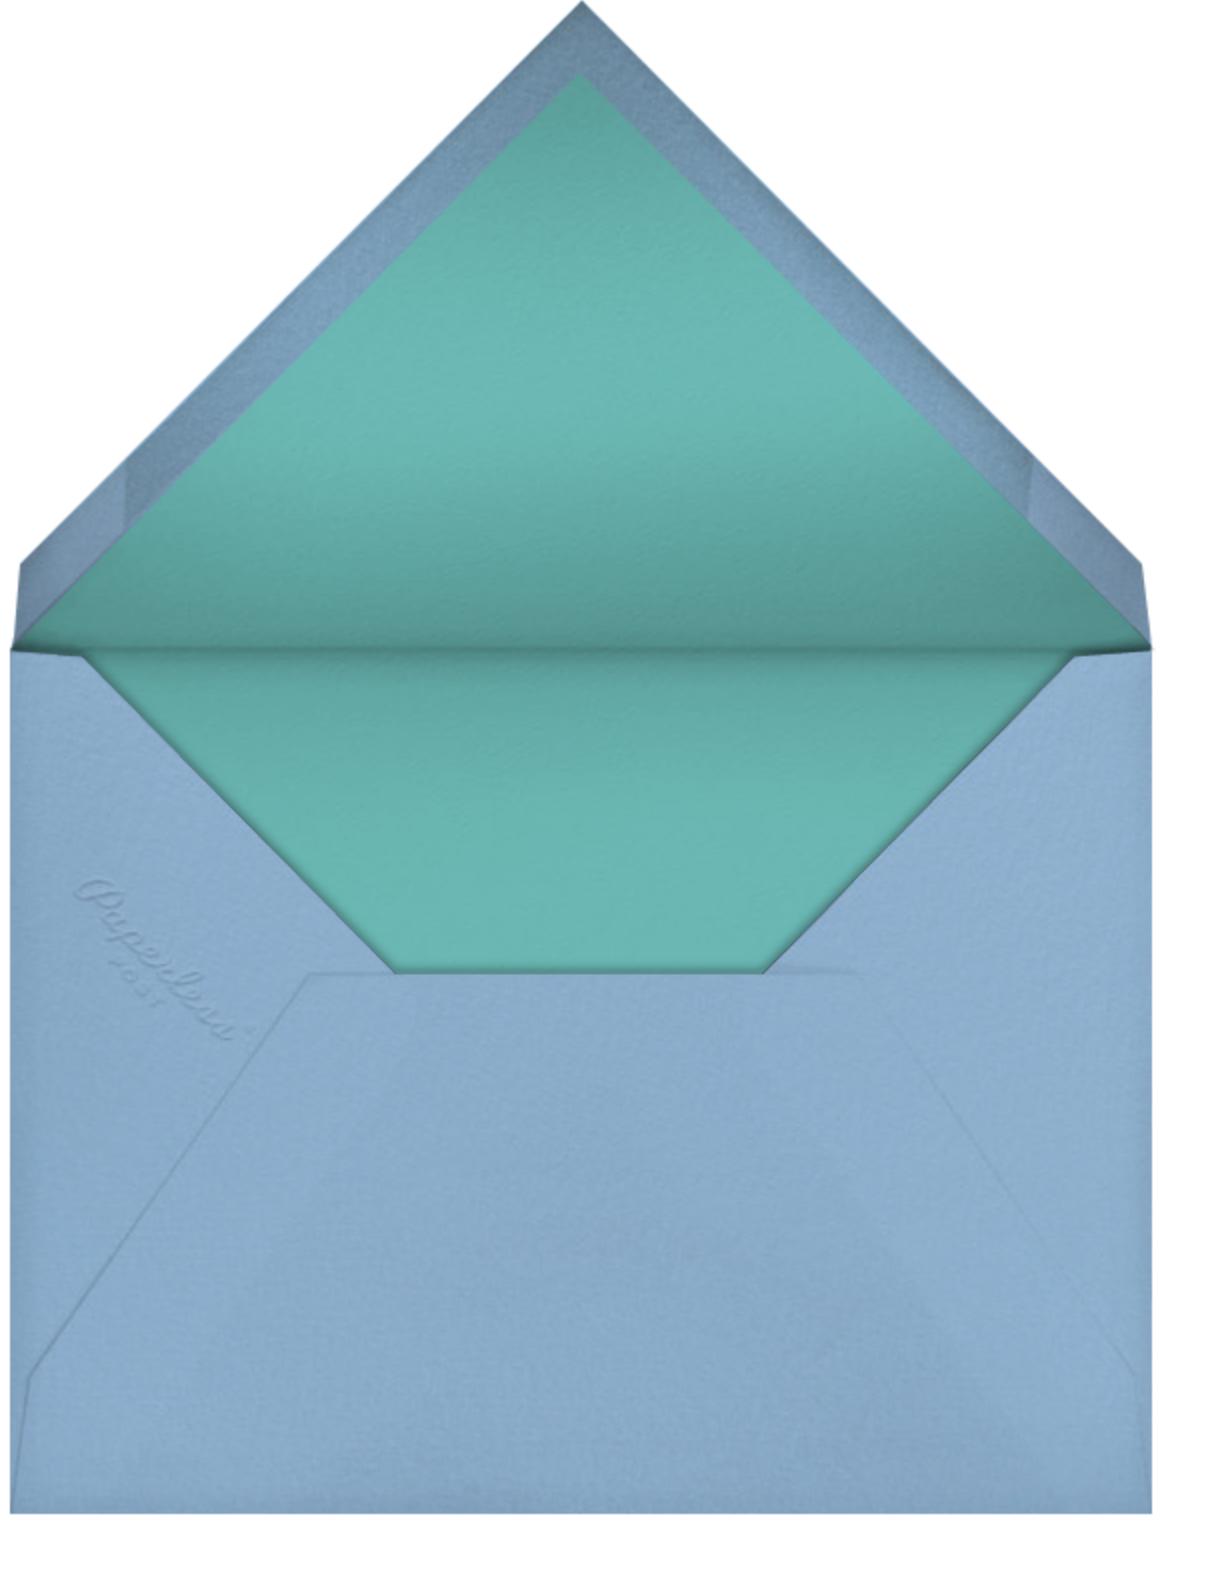 Faces (Stationery) - Petit Collage - Kids' stationery - envelope back